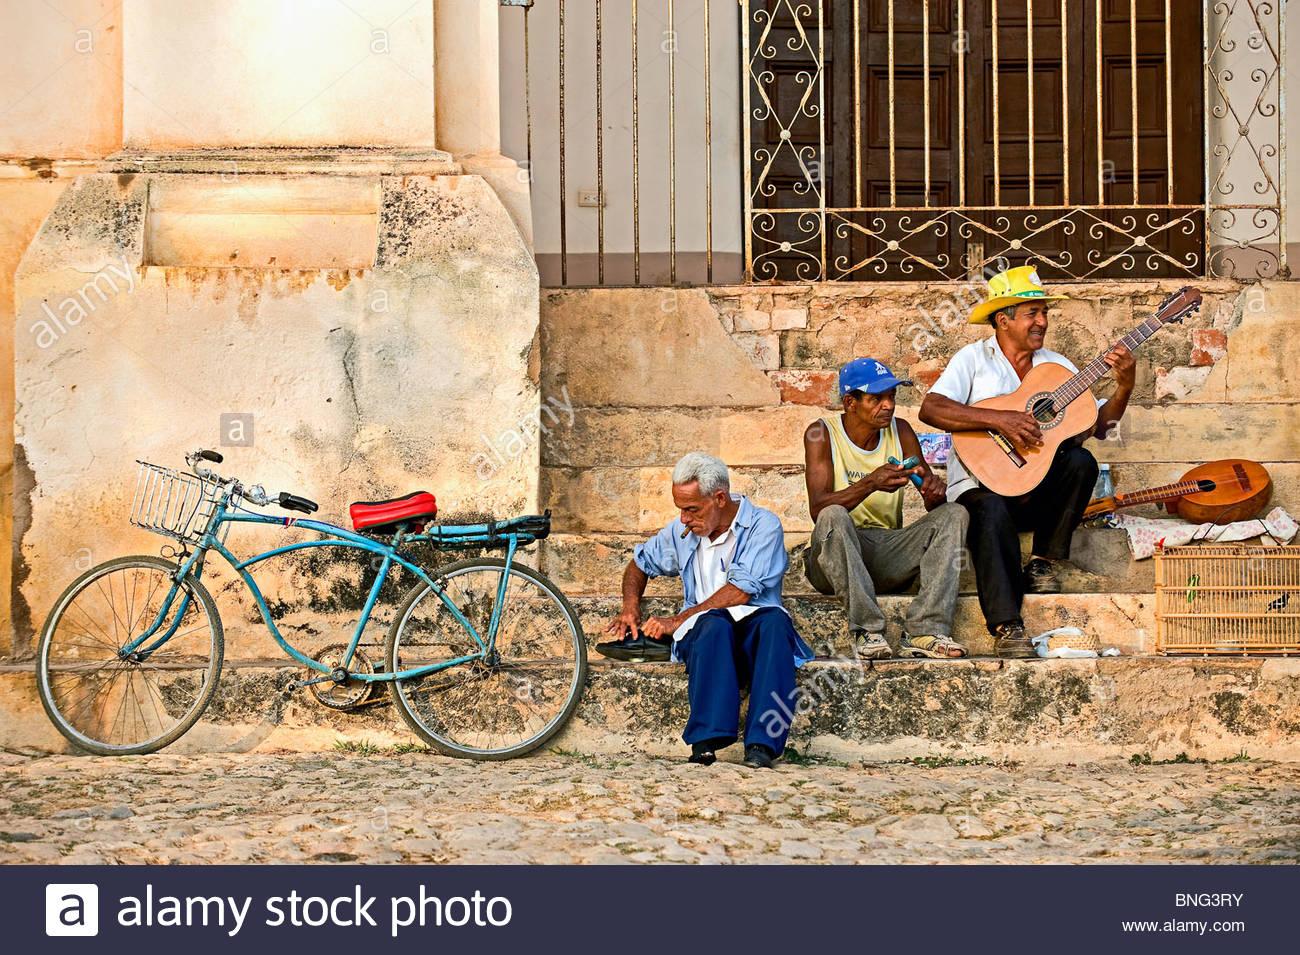 Street musicians. Trinidad,province of Sancti Spiritus,Cuba - Stock Image